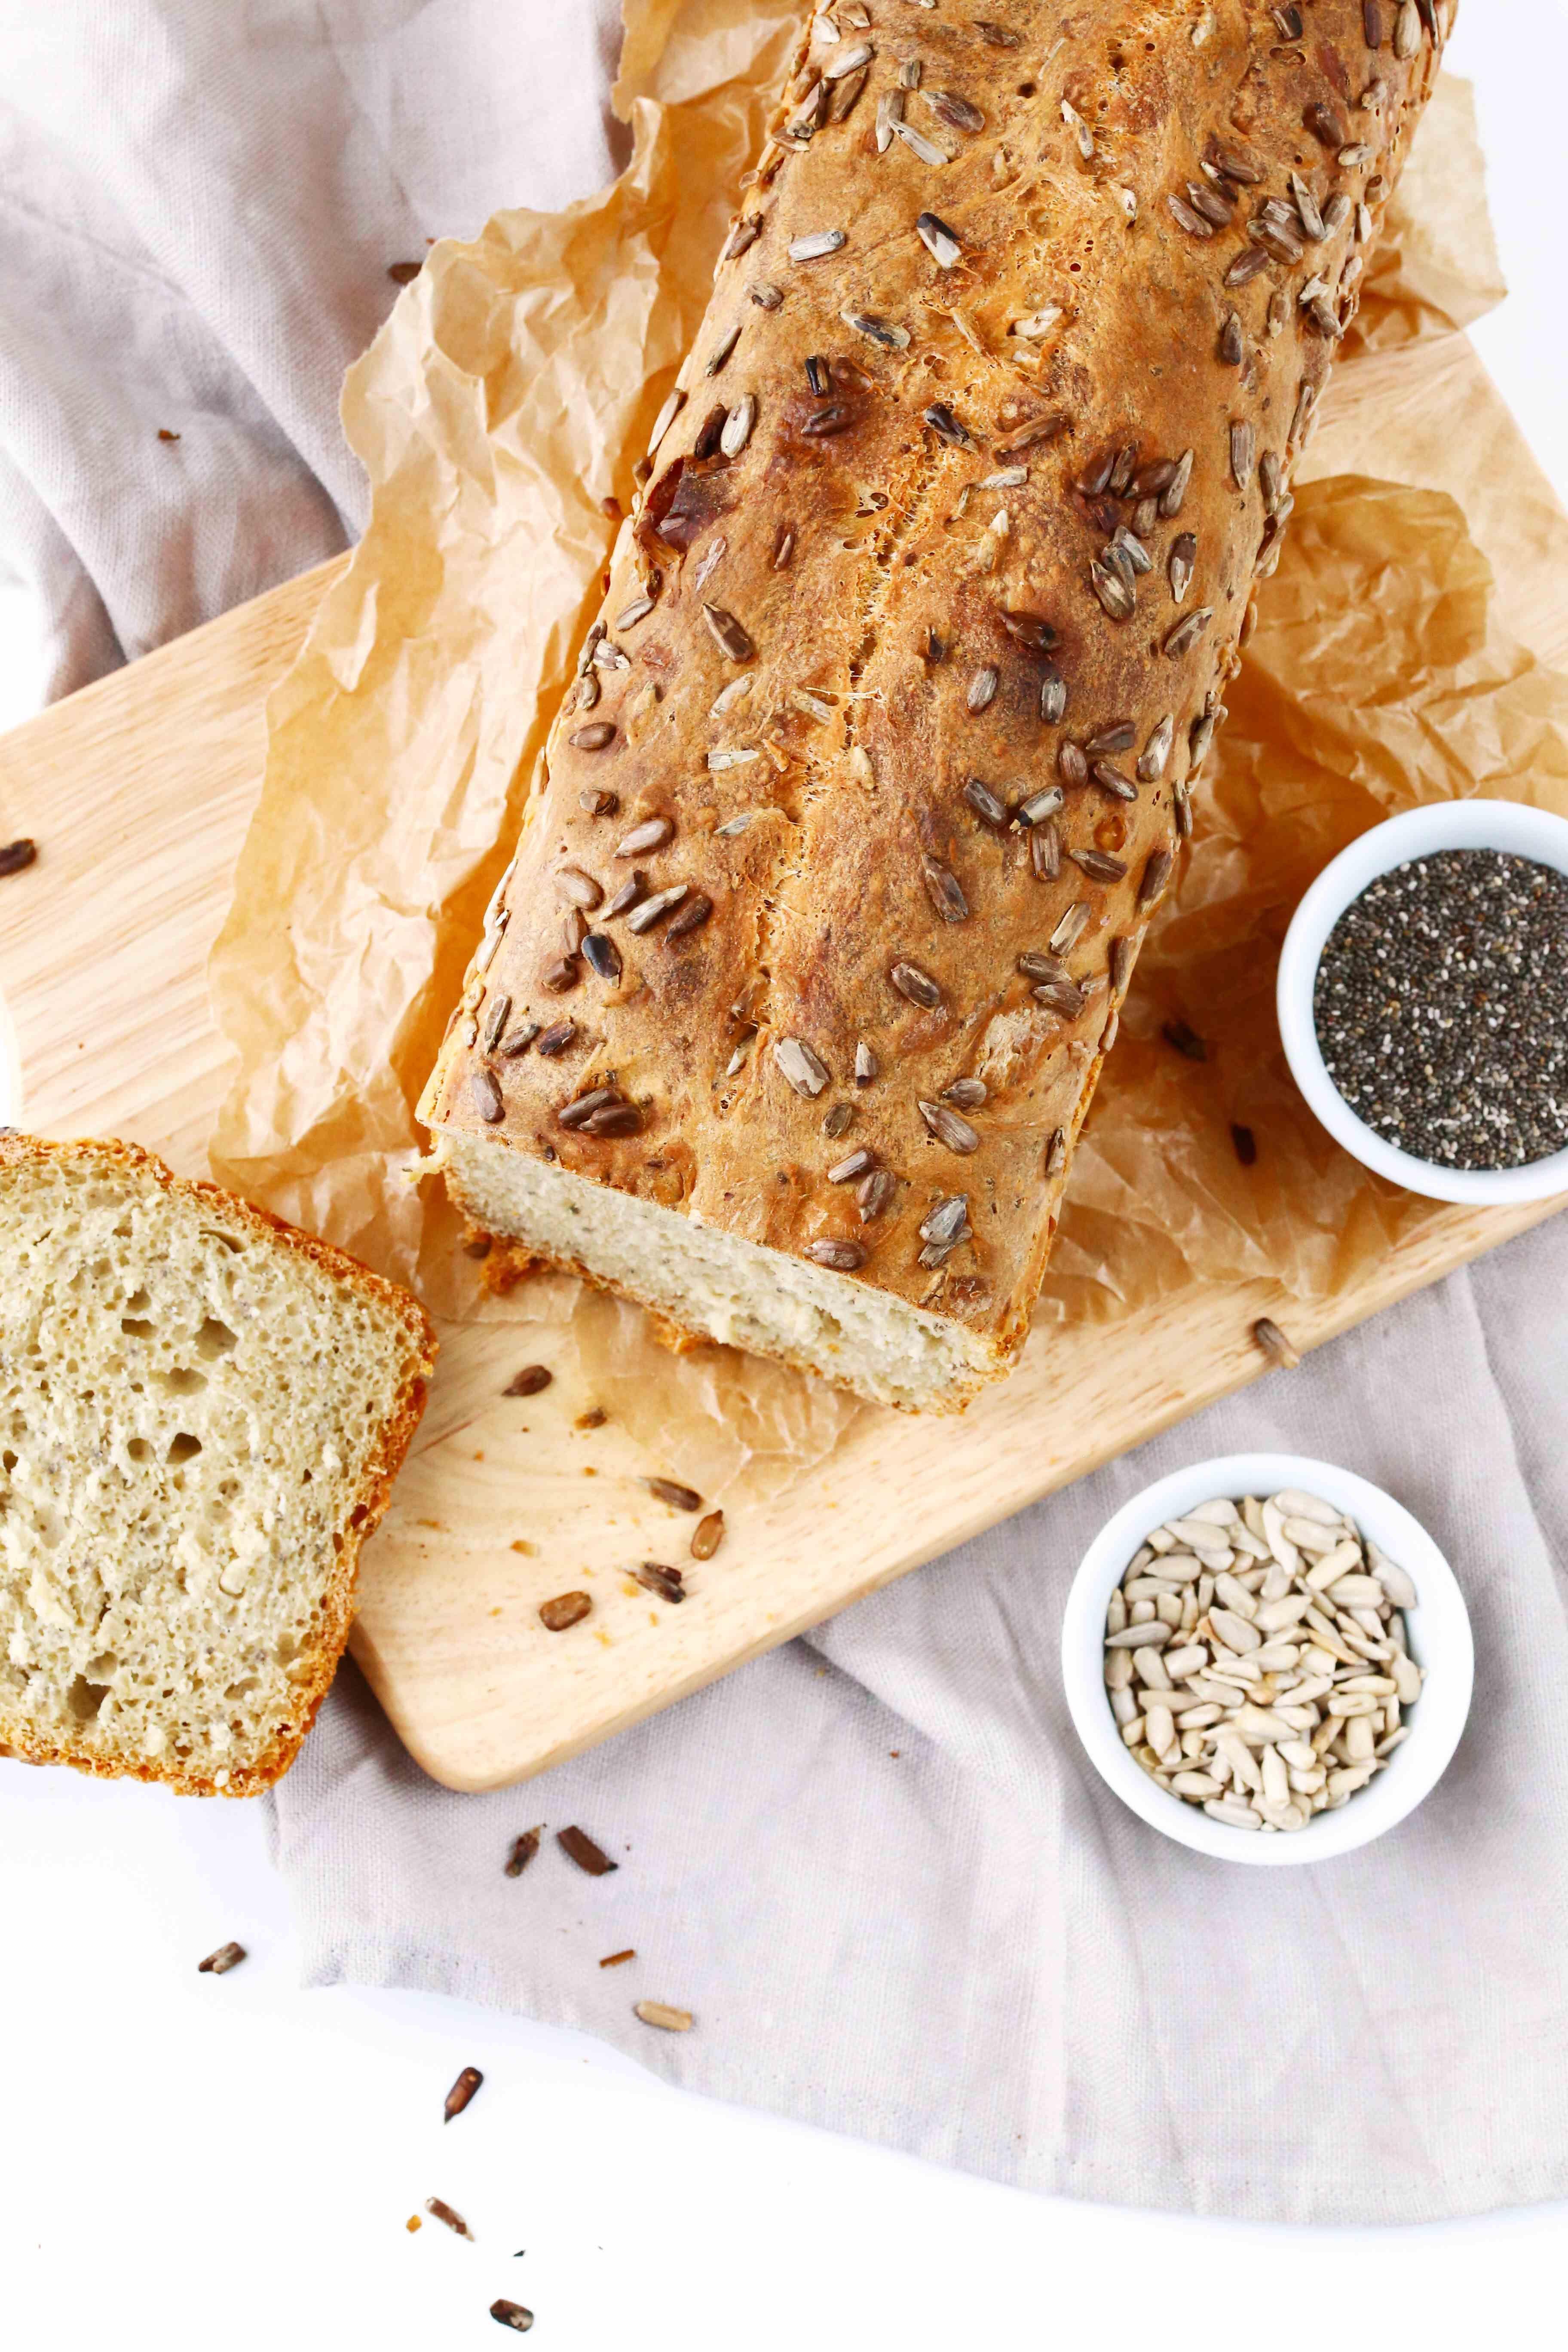 Dinkel Joghurt Brot Mit Chia Samen Recipe Brot Chia Samen Brot